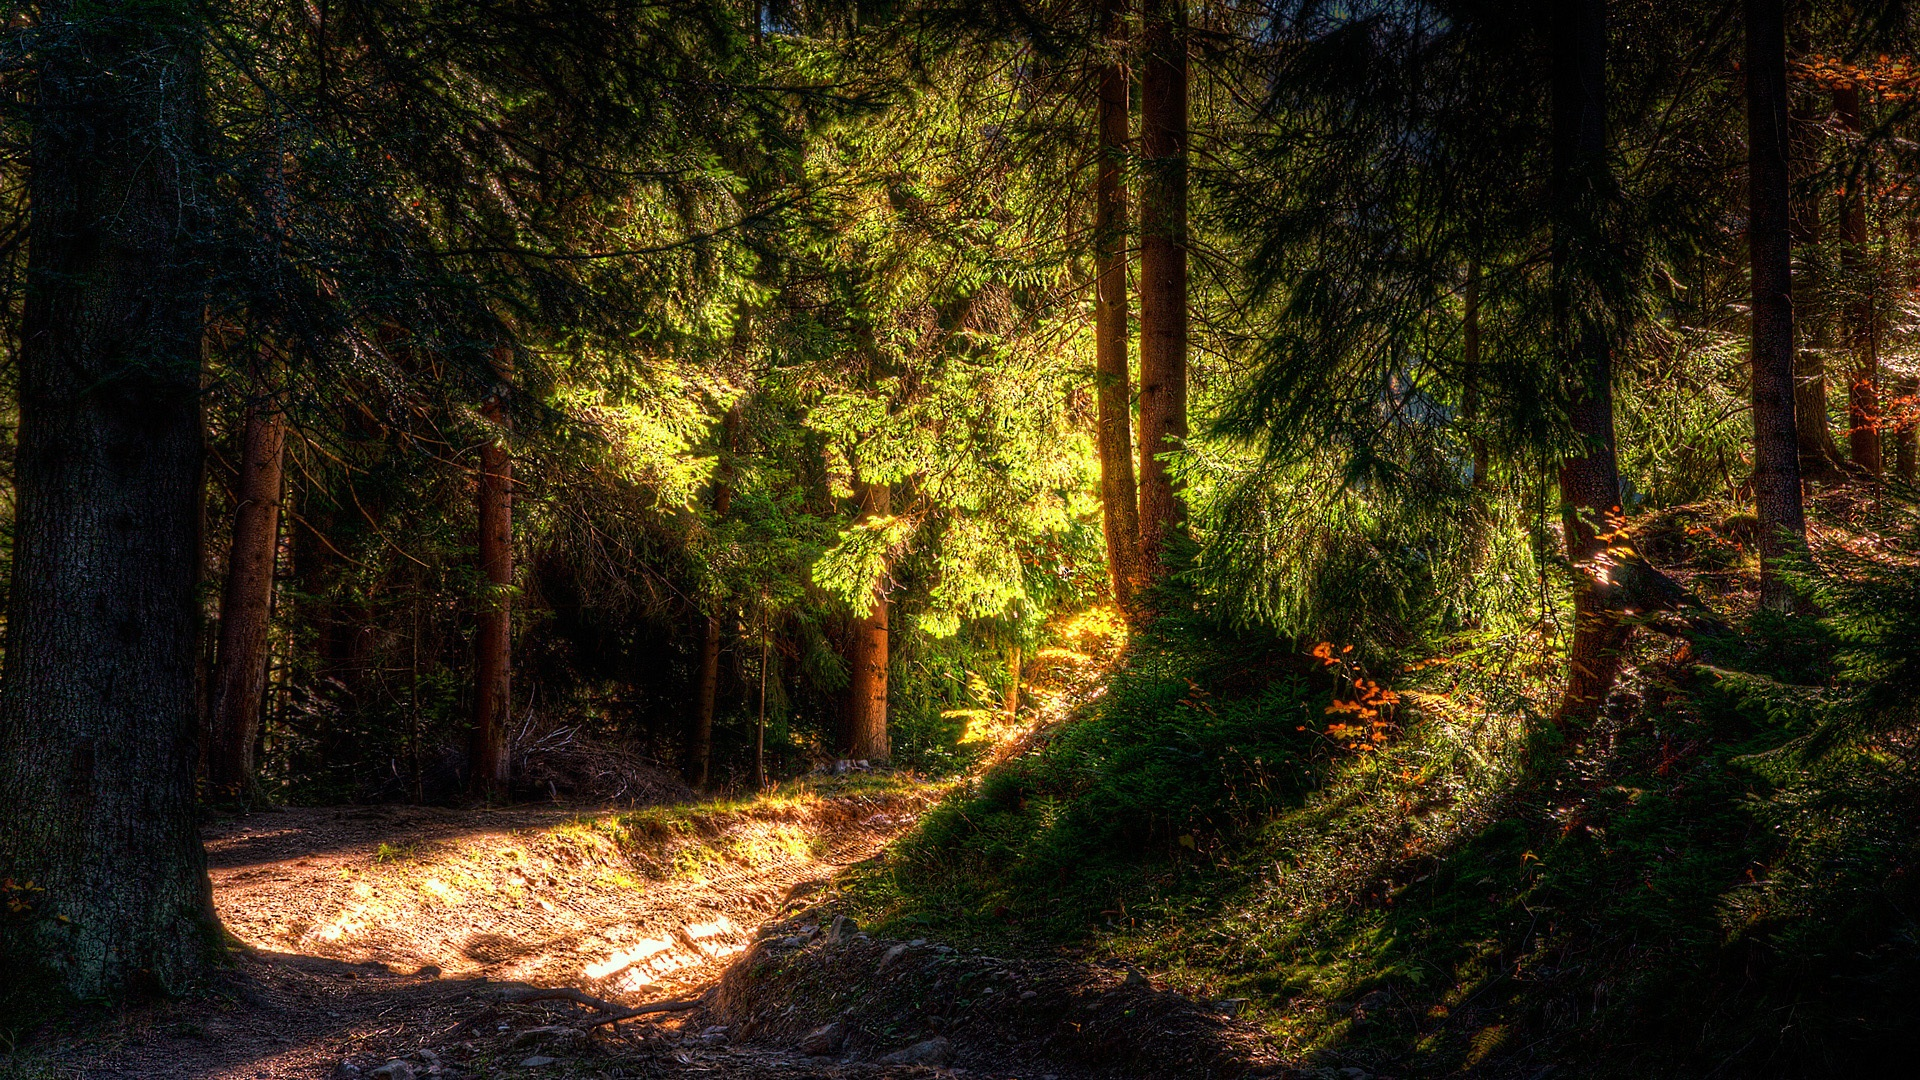 Full hd nature wallpaper nature hd wallpapers ImgStockscom 1920x1080